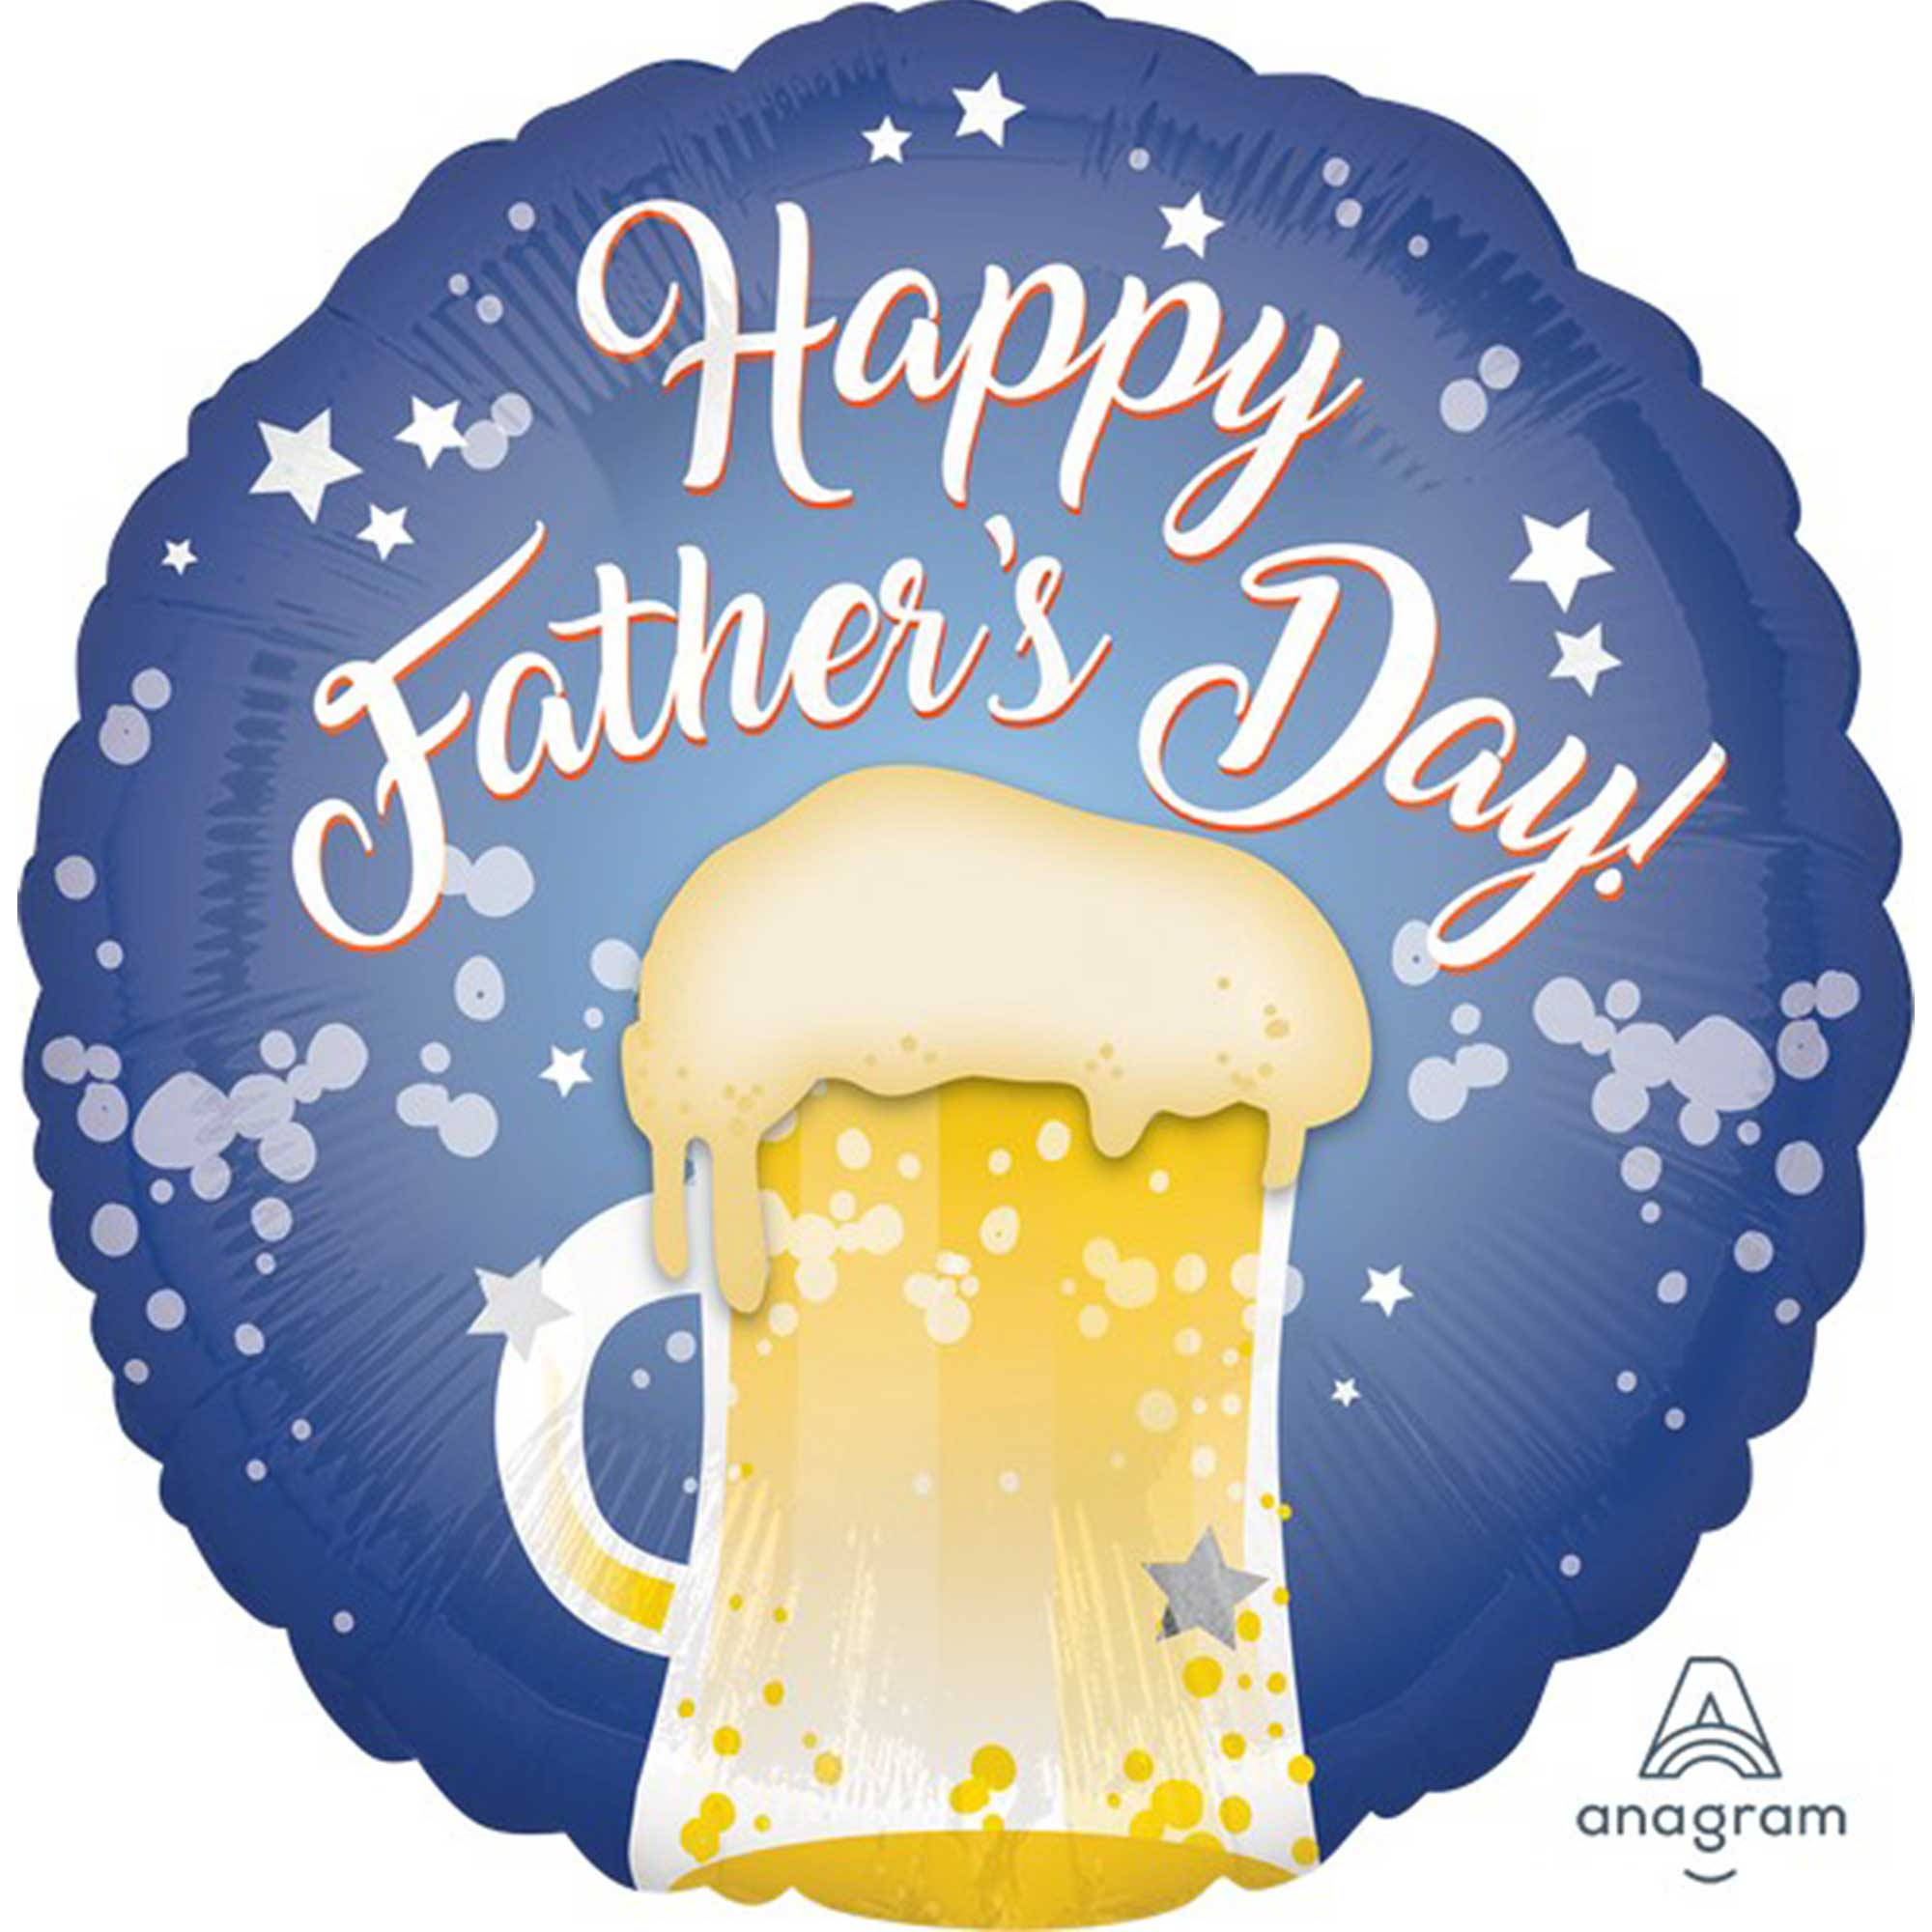 45cm Standard HX Happy Fathers Day Beer Mug S40